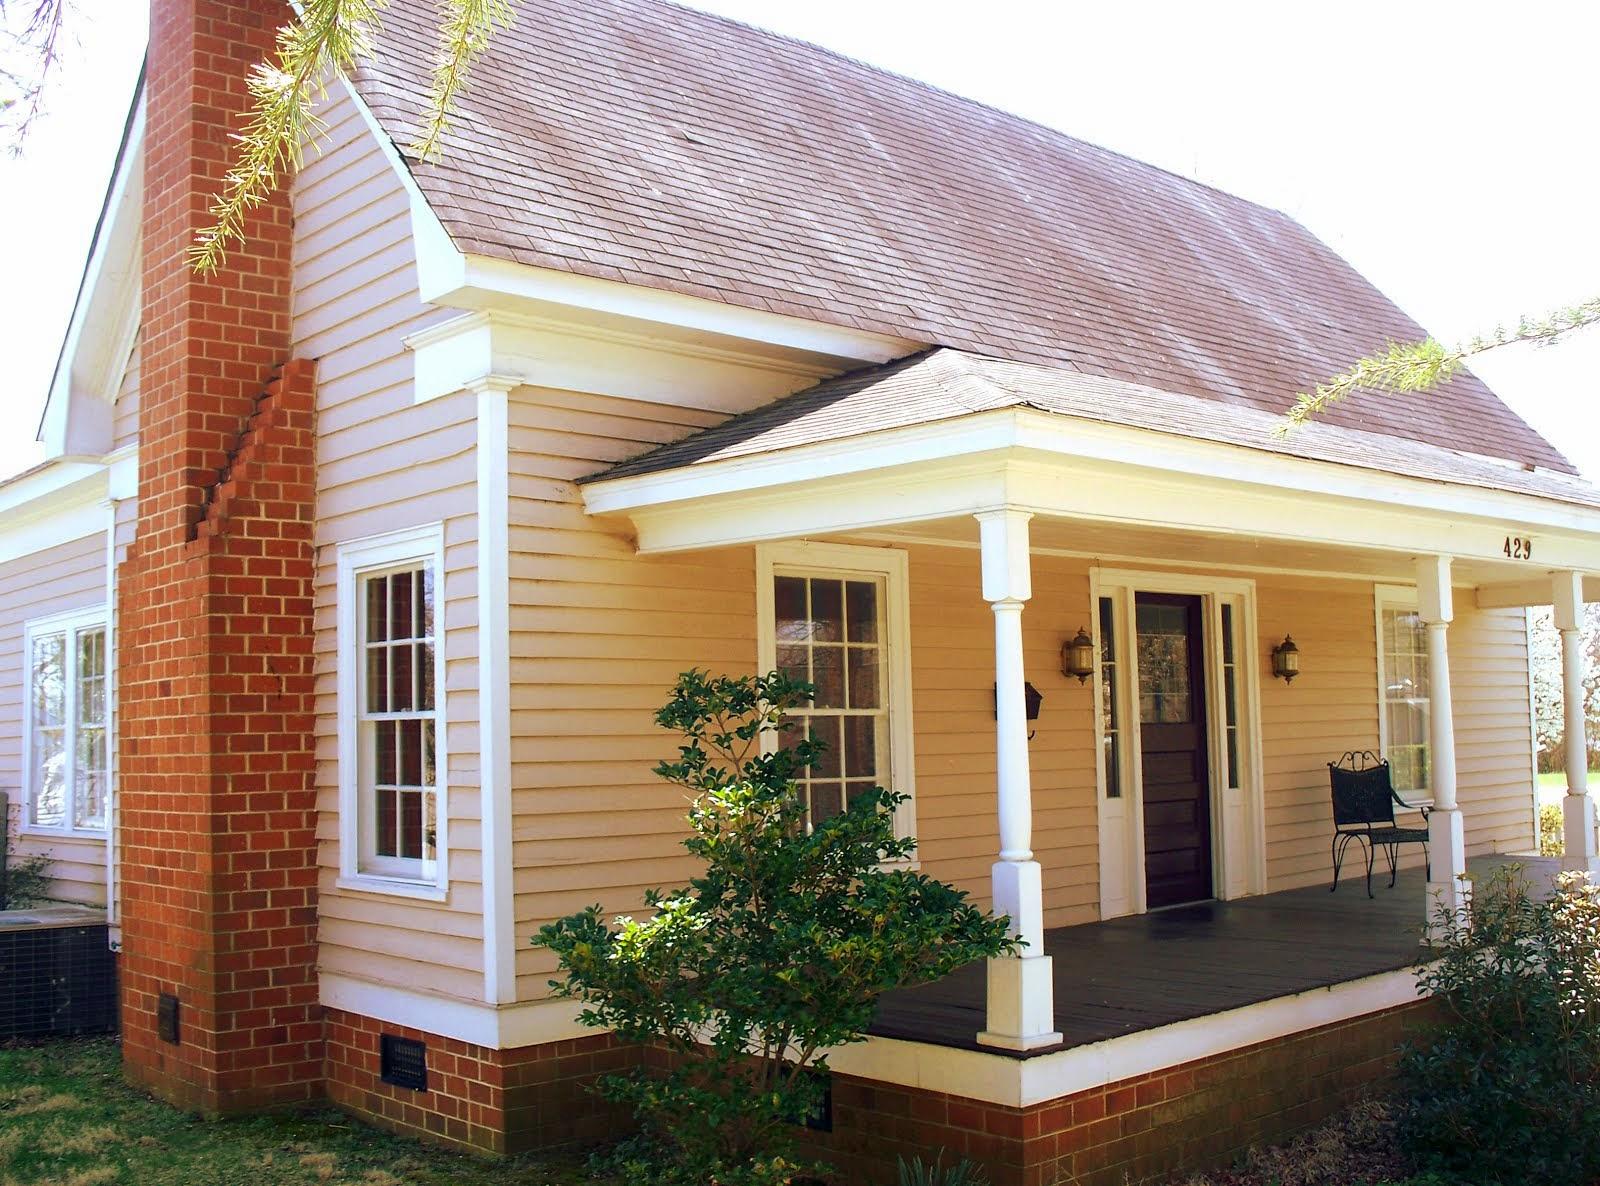 429 S Church Street, Salisbury NC 28144 ~ circa 1850 ~ $85,000